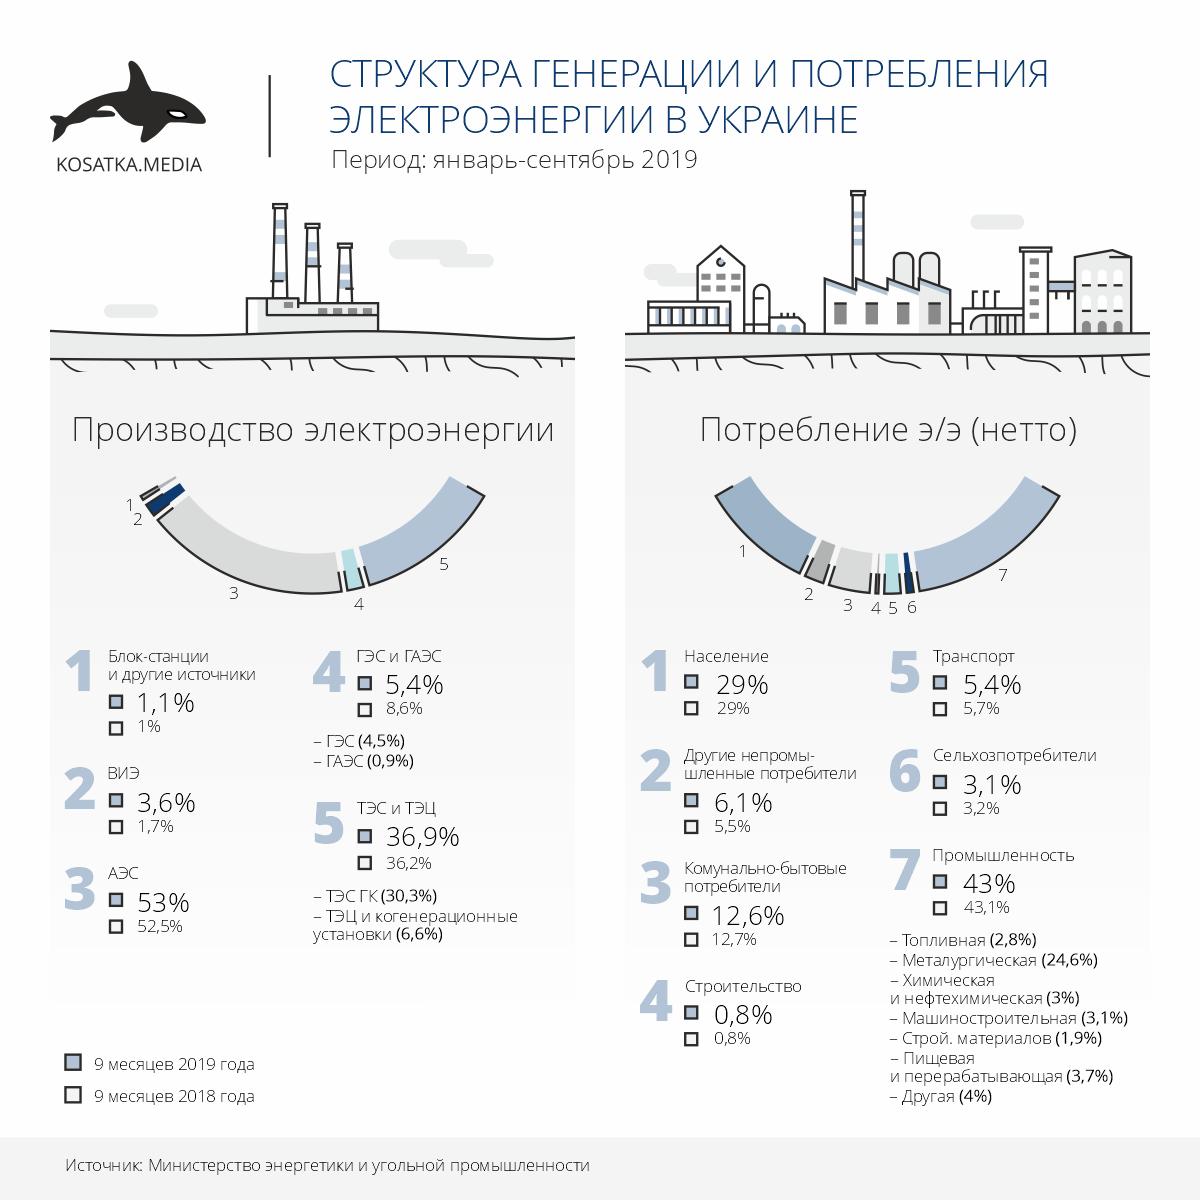 Структура генерации электроэнергии, структура потребления электроэнергии